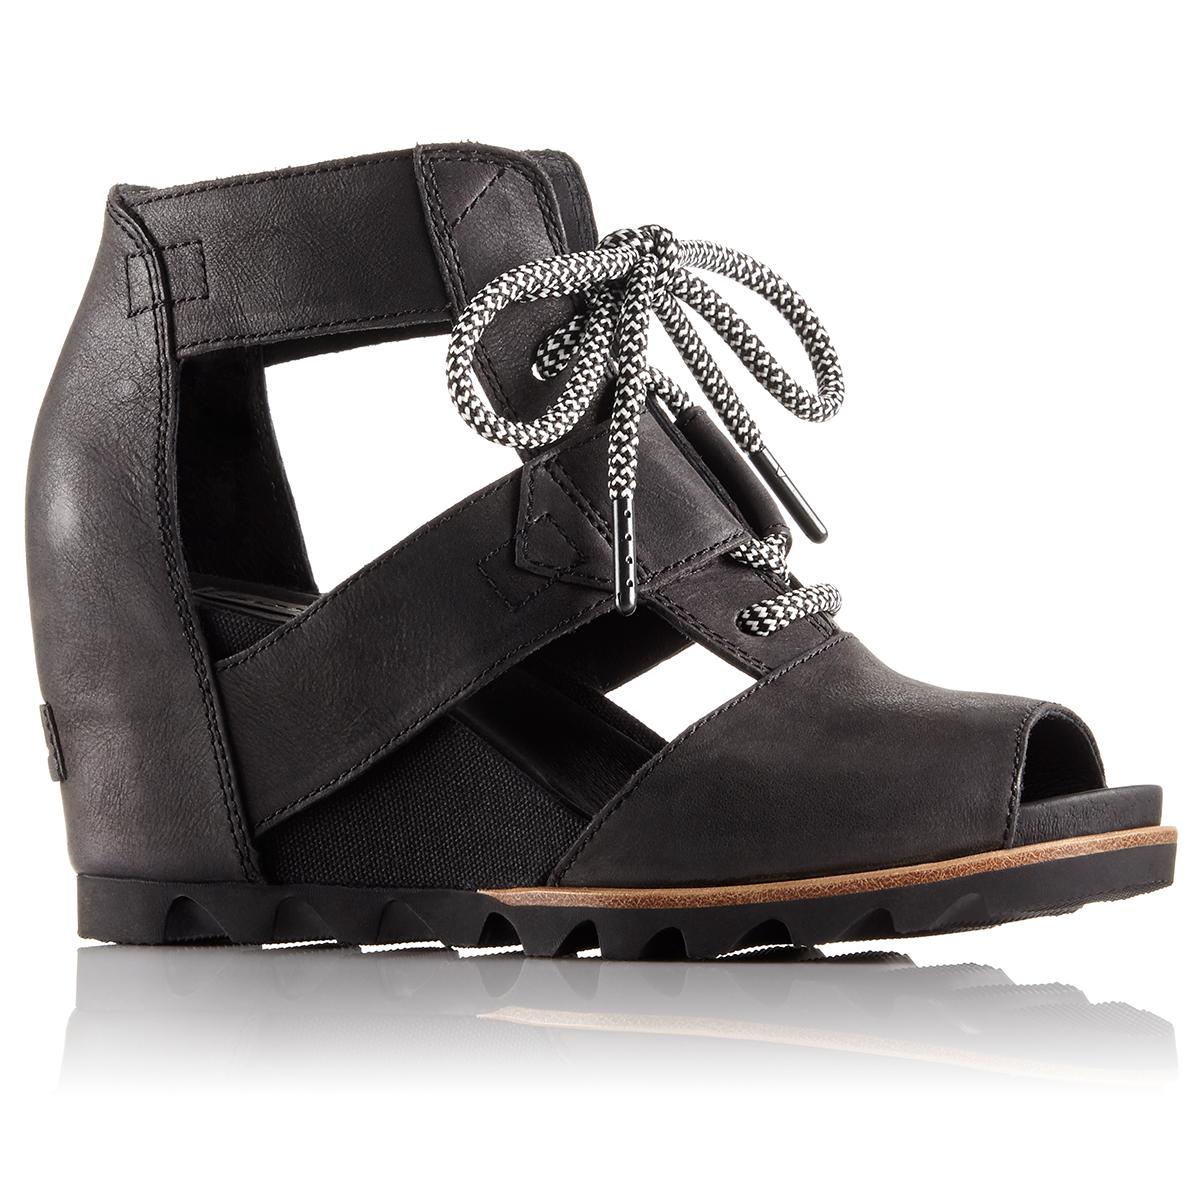 Sorel Women's Joanie Lace Wedge Sandals - Black, 11